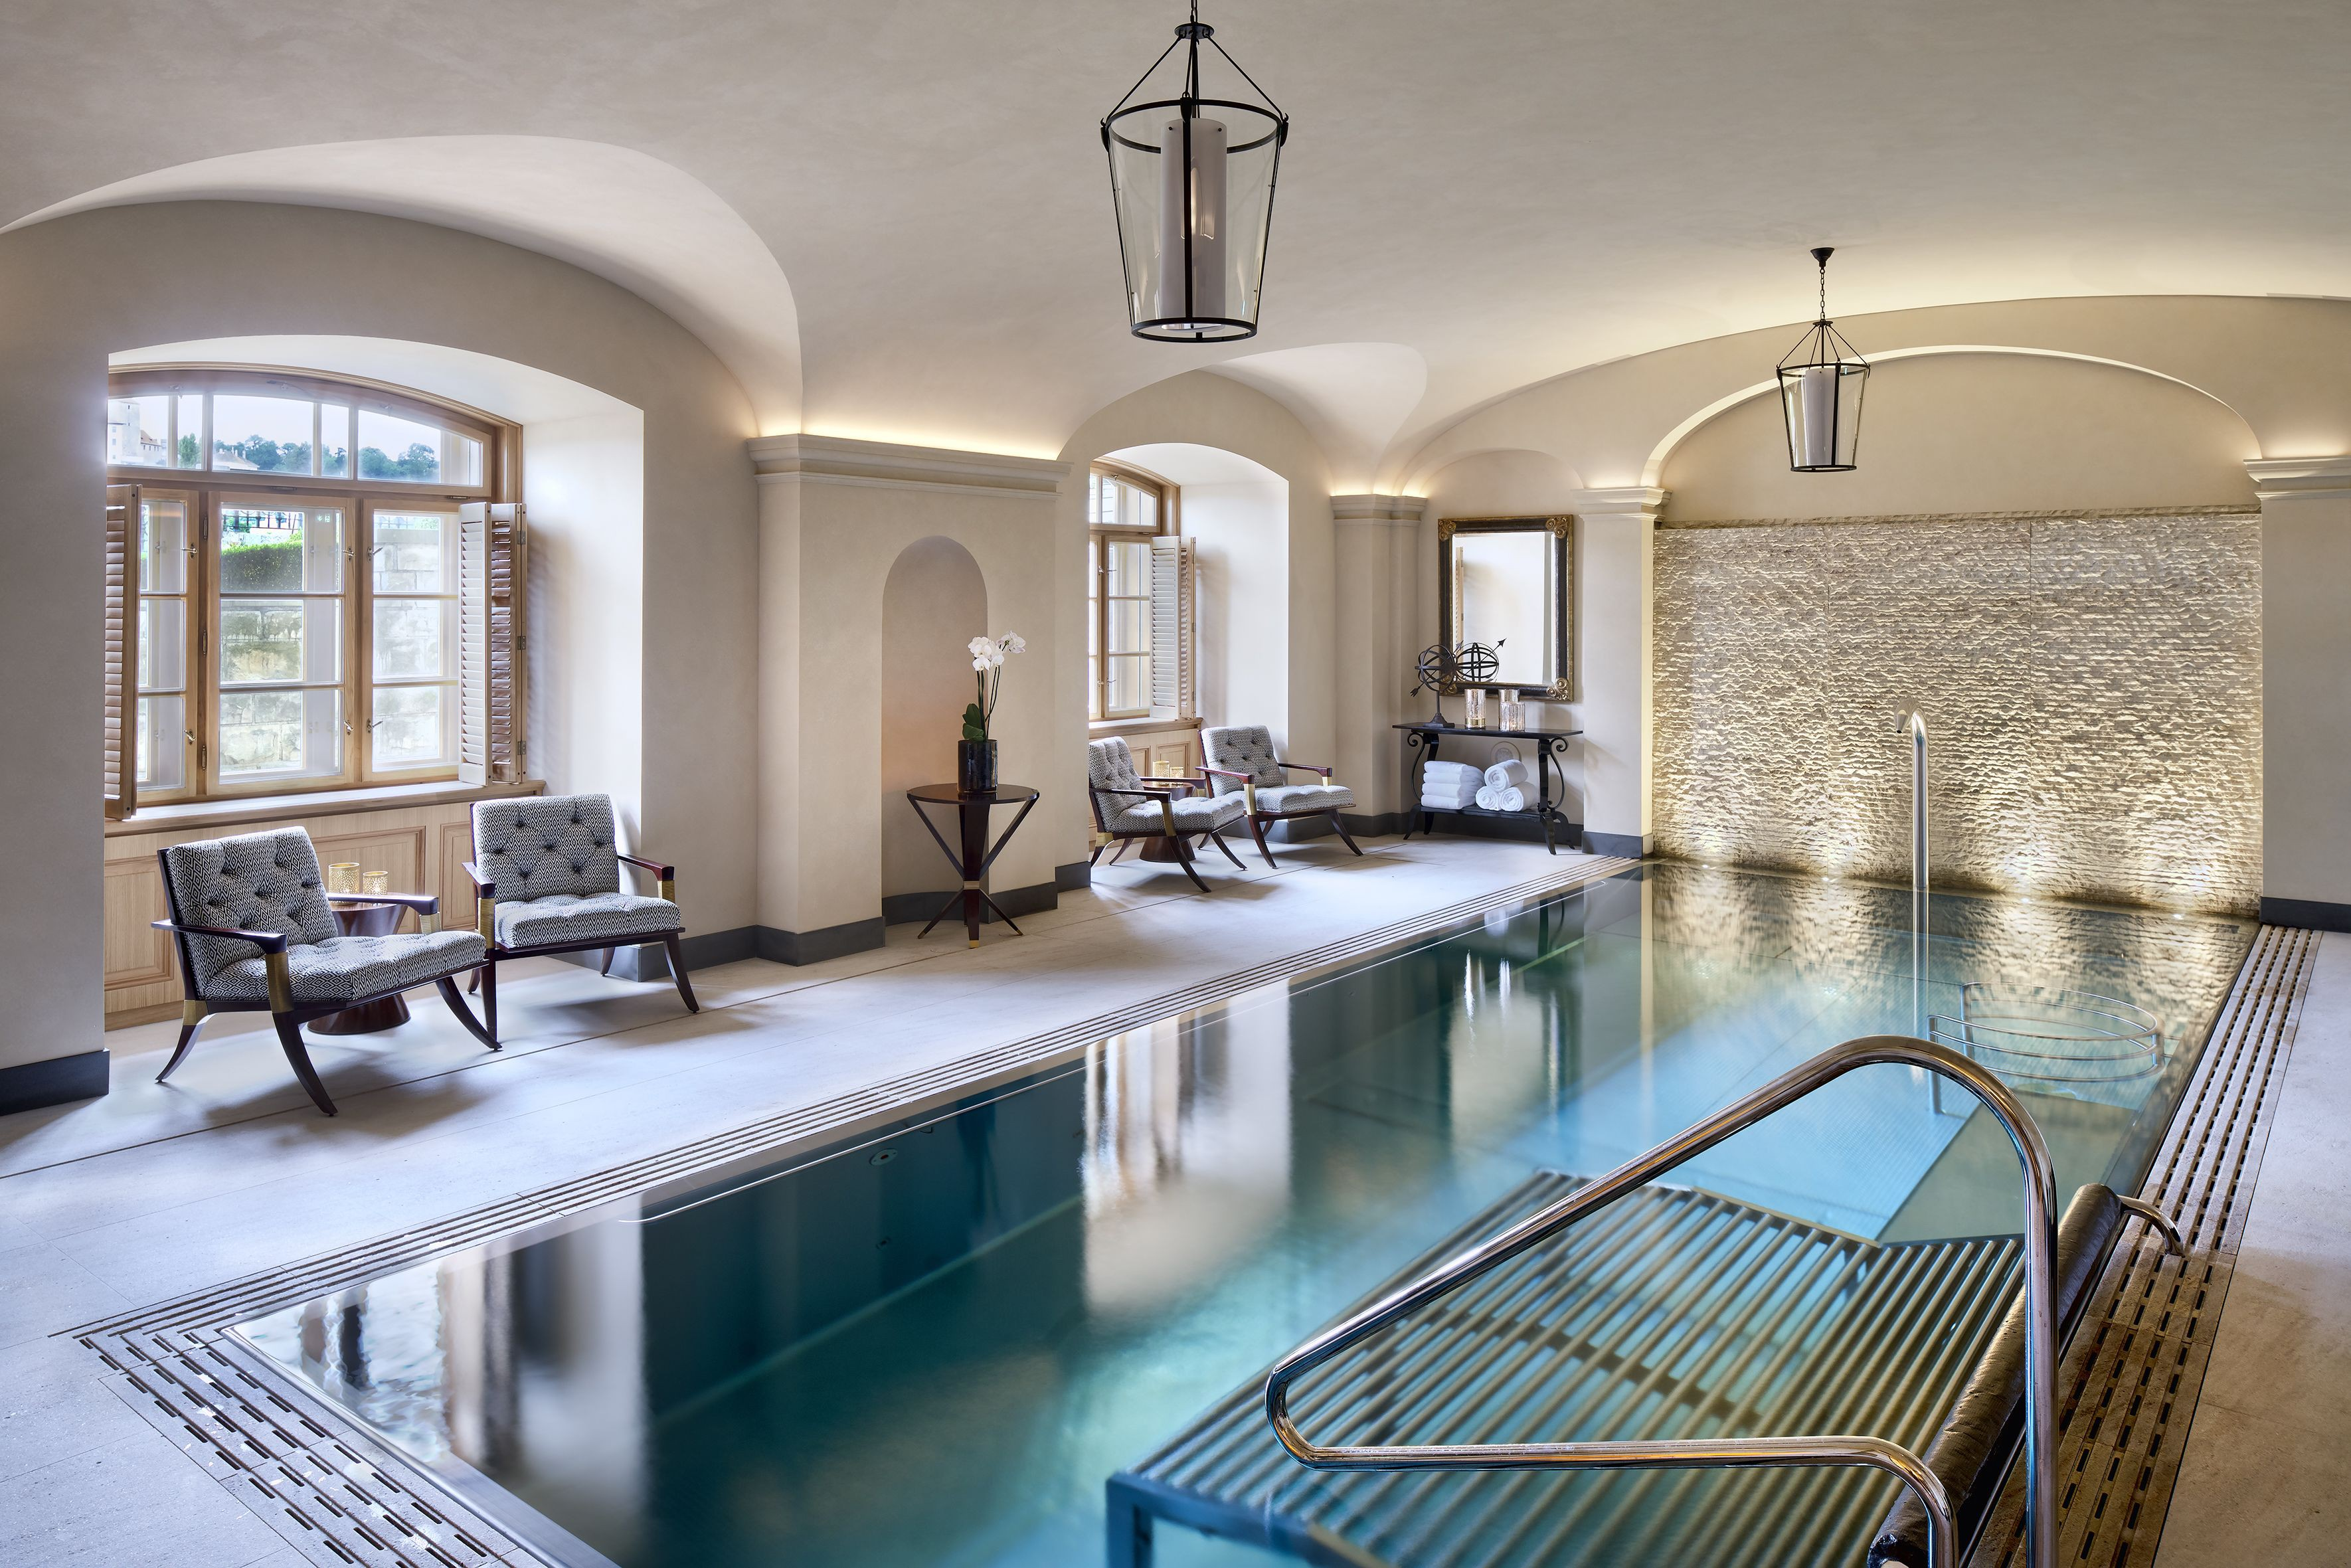 Courtesy of Four Seasons Hotel Prague / Expedia